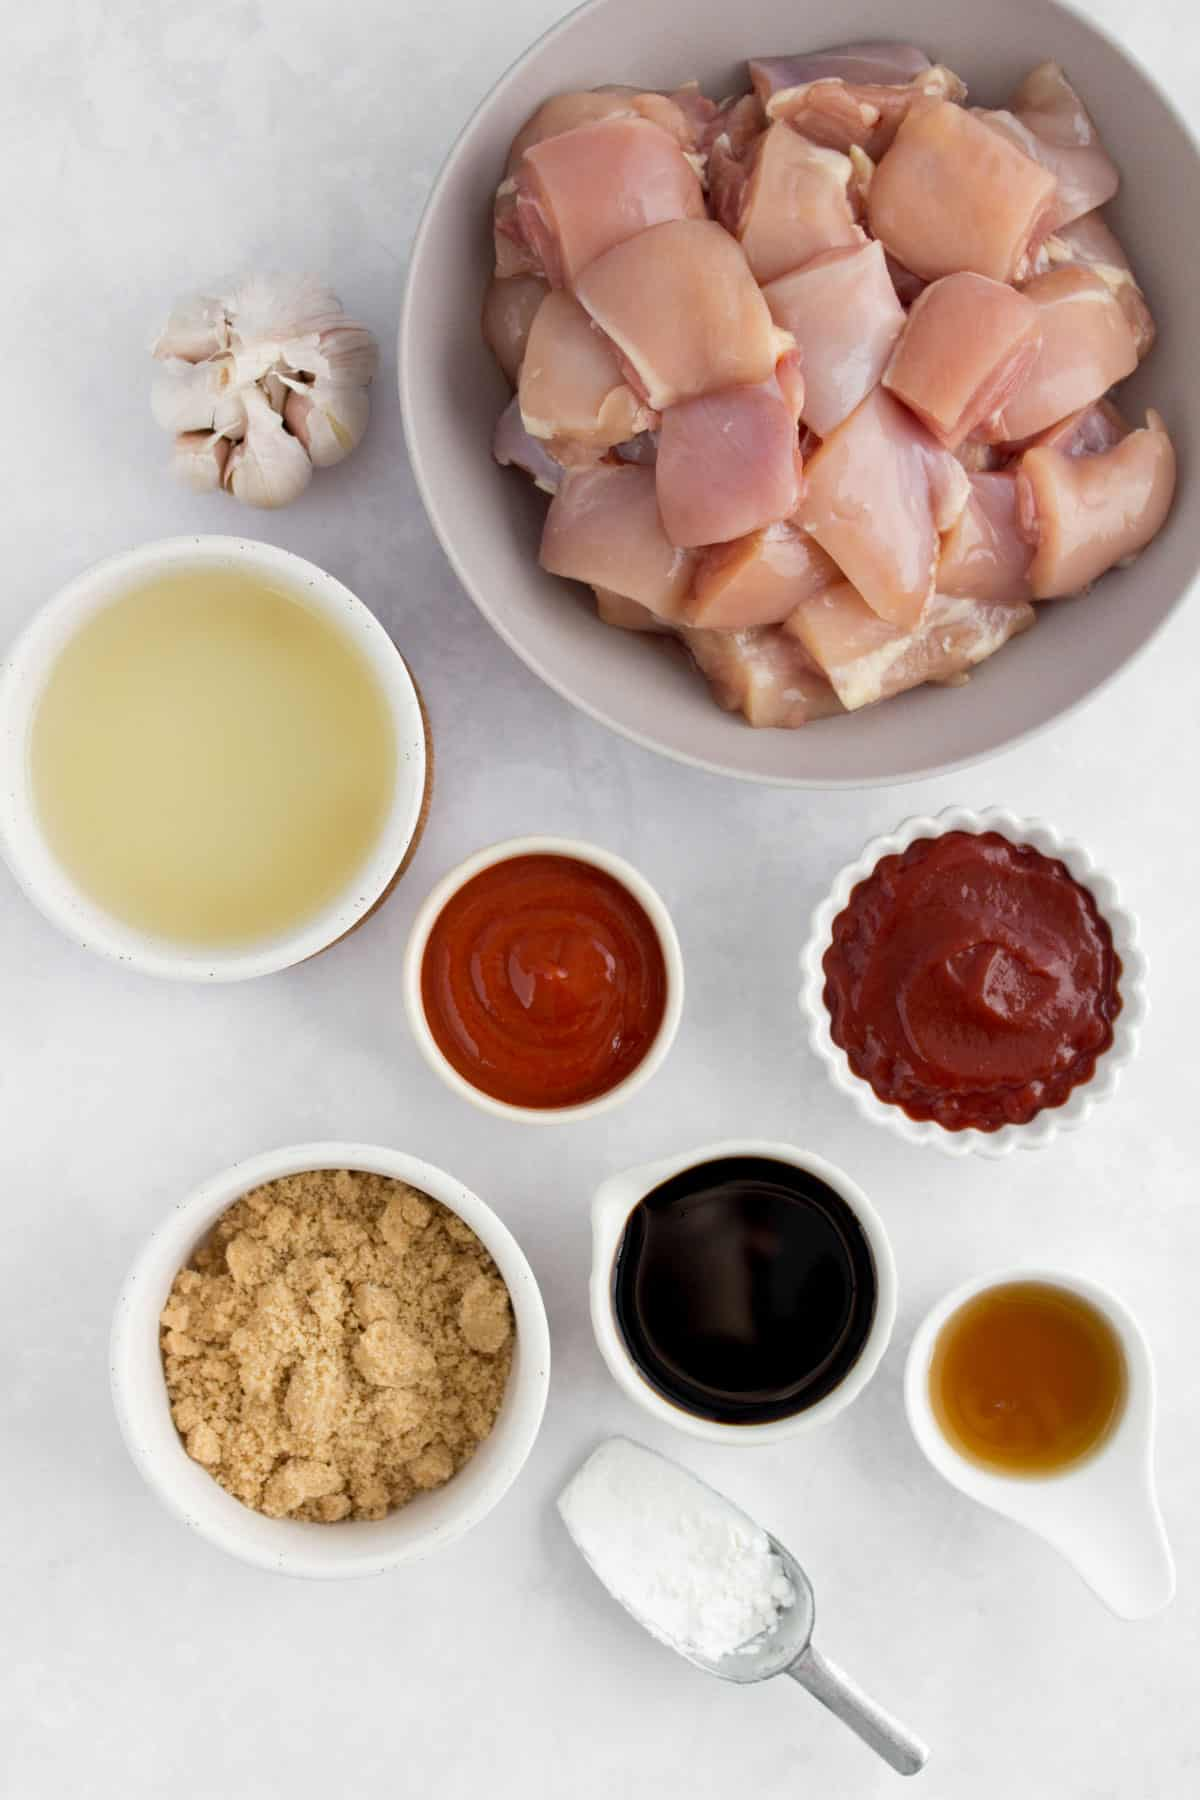 Overhead image of ingredients for instant pot sesame chicken.